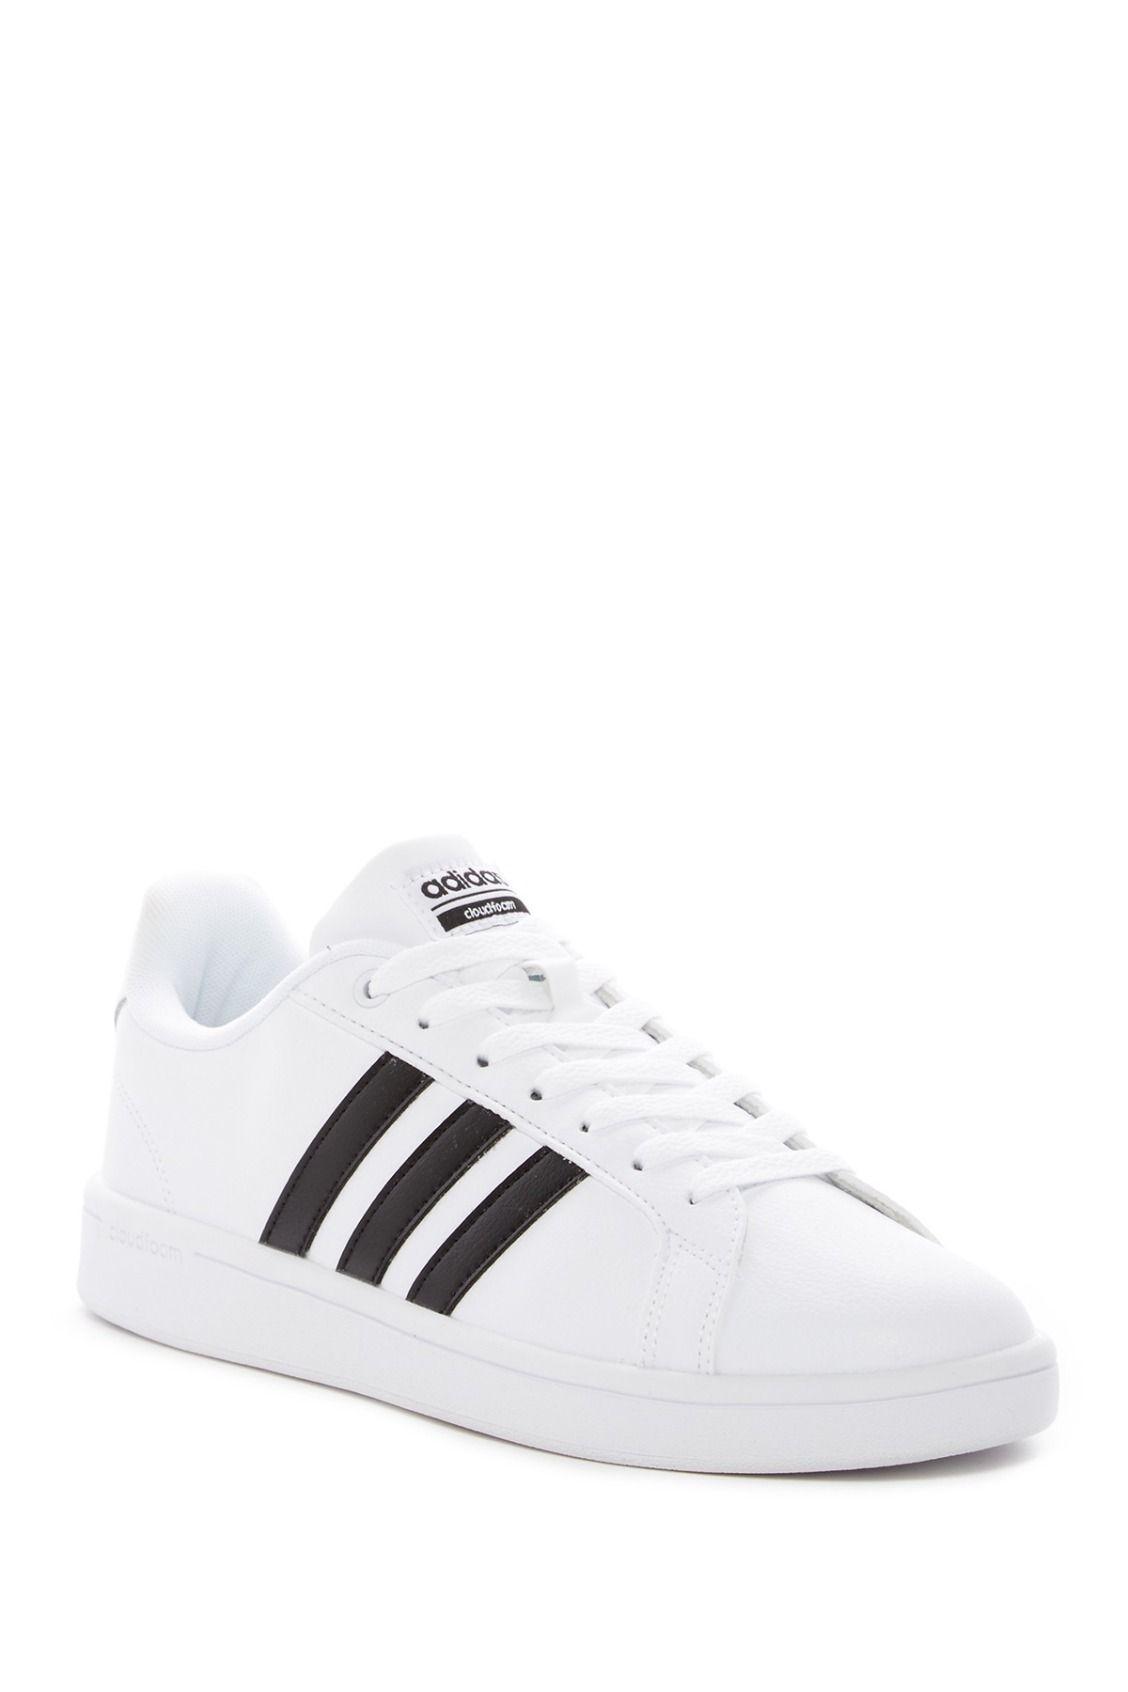 7044c376b2ee3 The classics. adidas Cloudfoam Advantage Sneakers